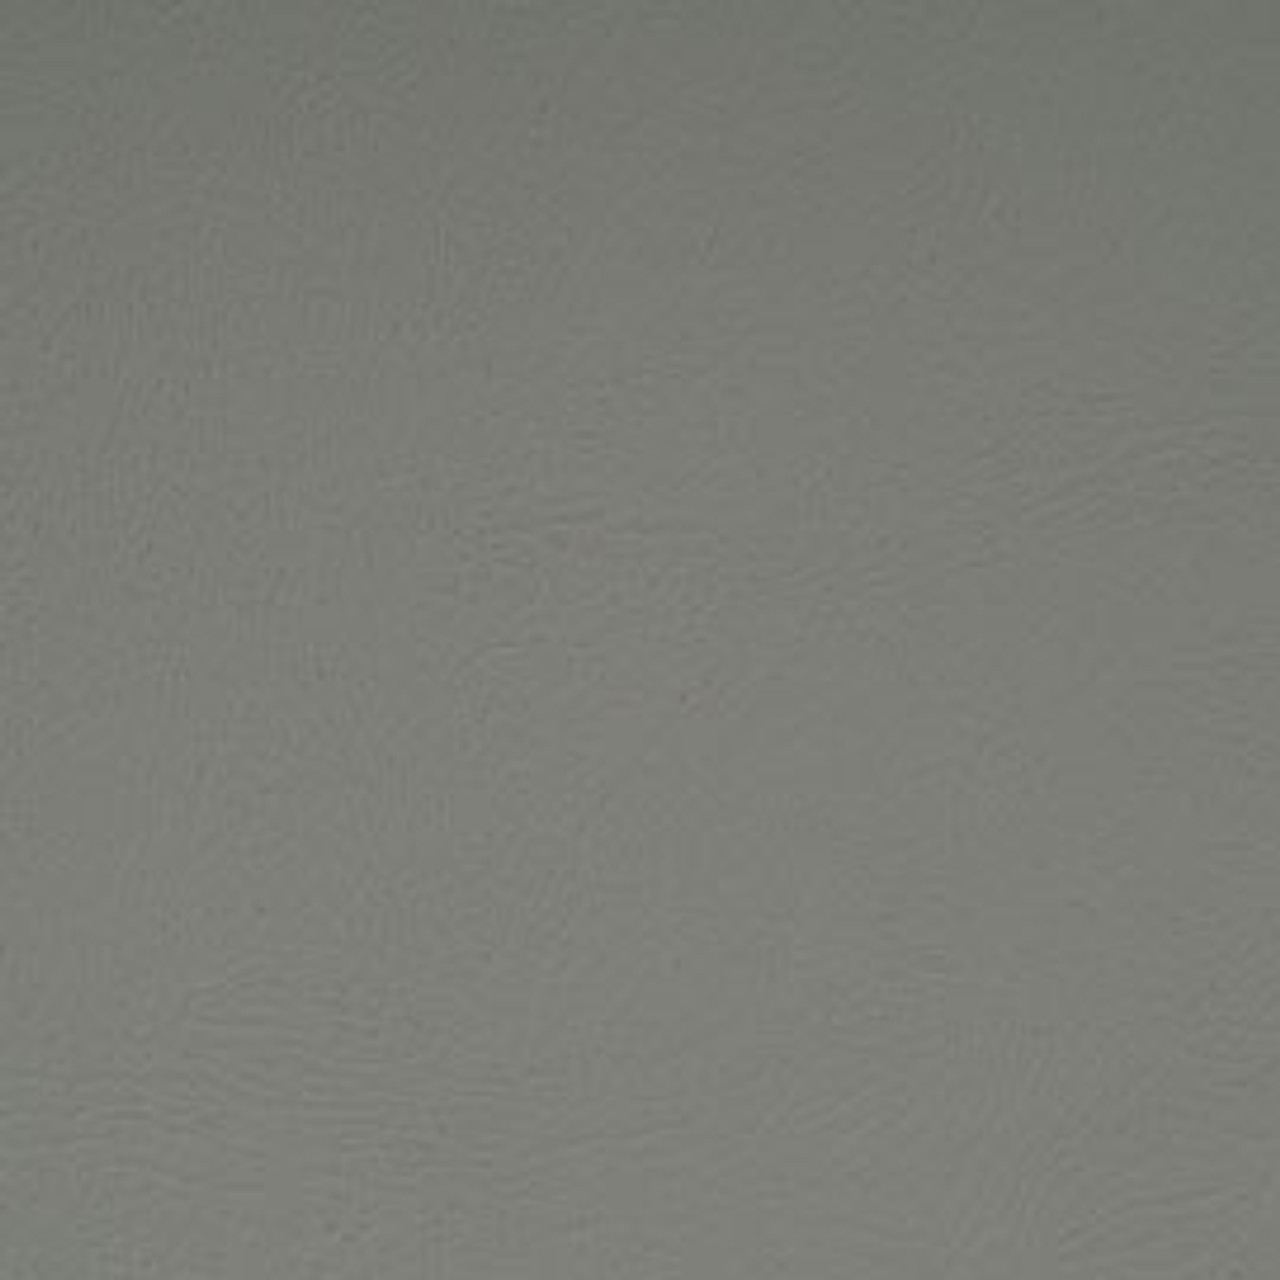 "Monticello 6890 Medium Grey Vinyl 54"" - Sold by the CONTINUOUS YARD!"